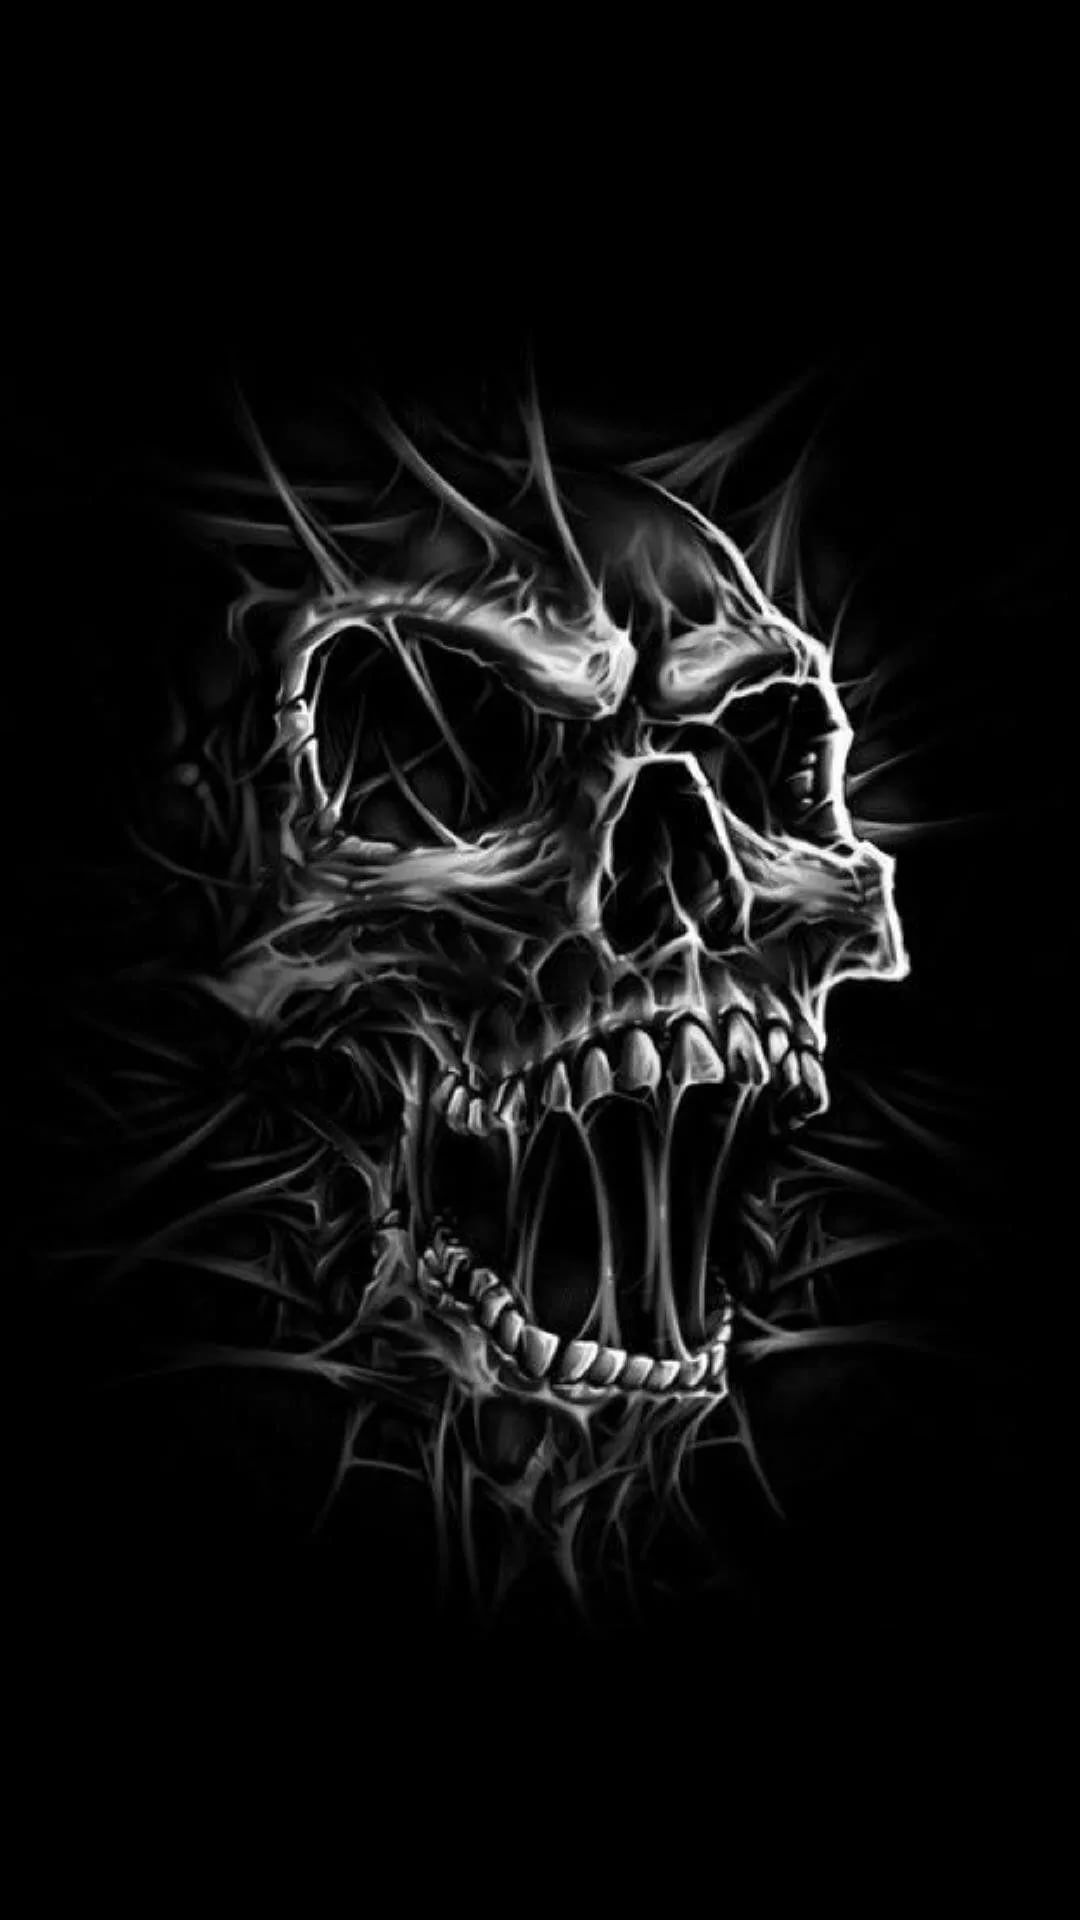 Cool Skull iPhone 6s plus wallpaper